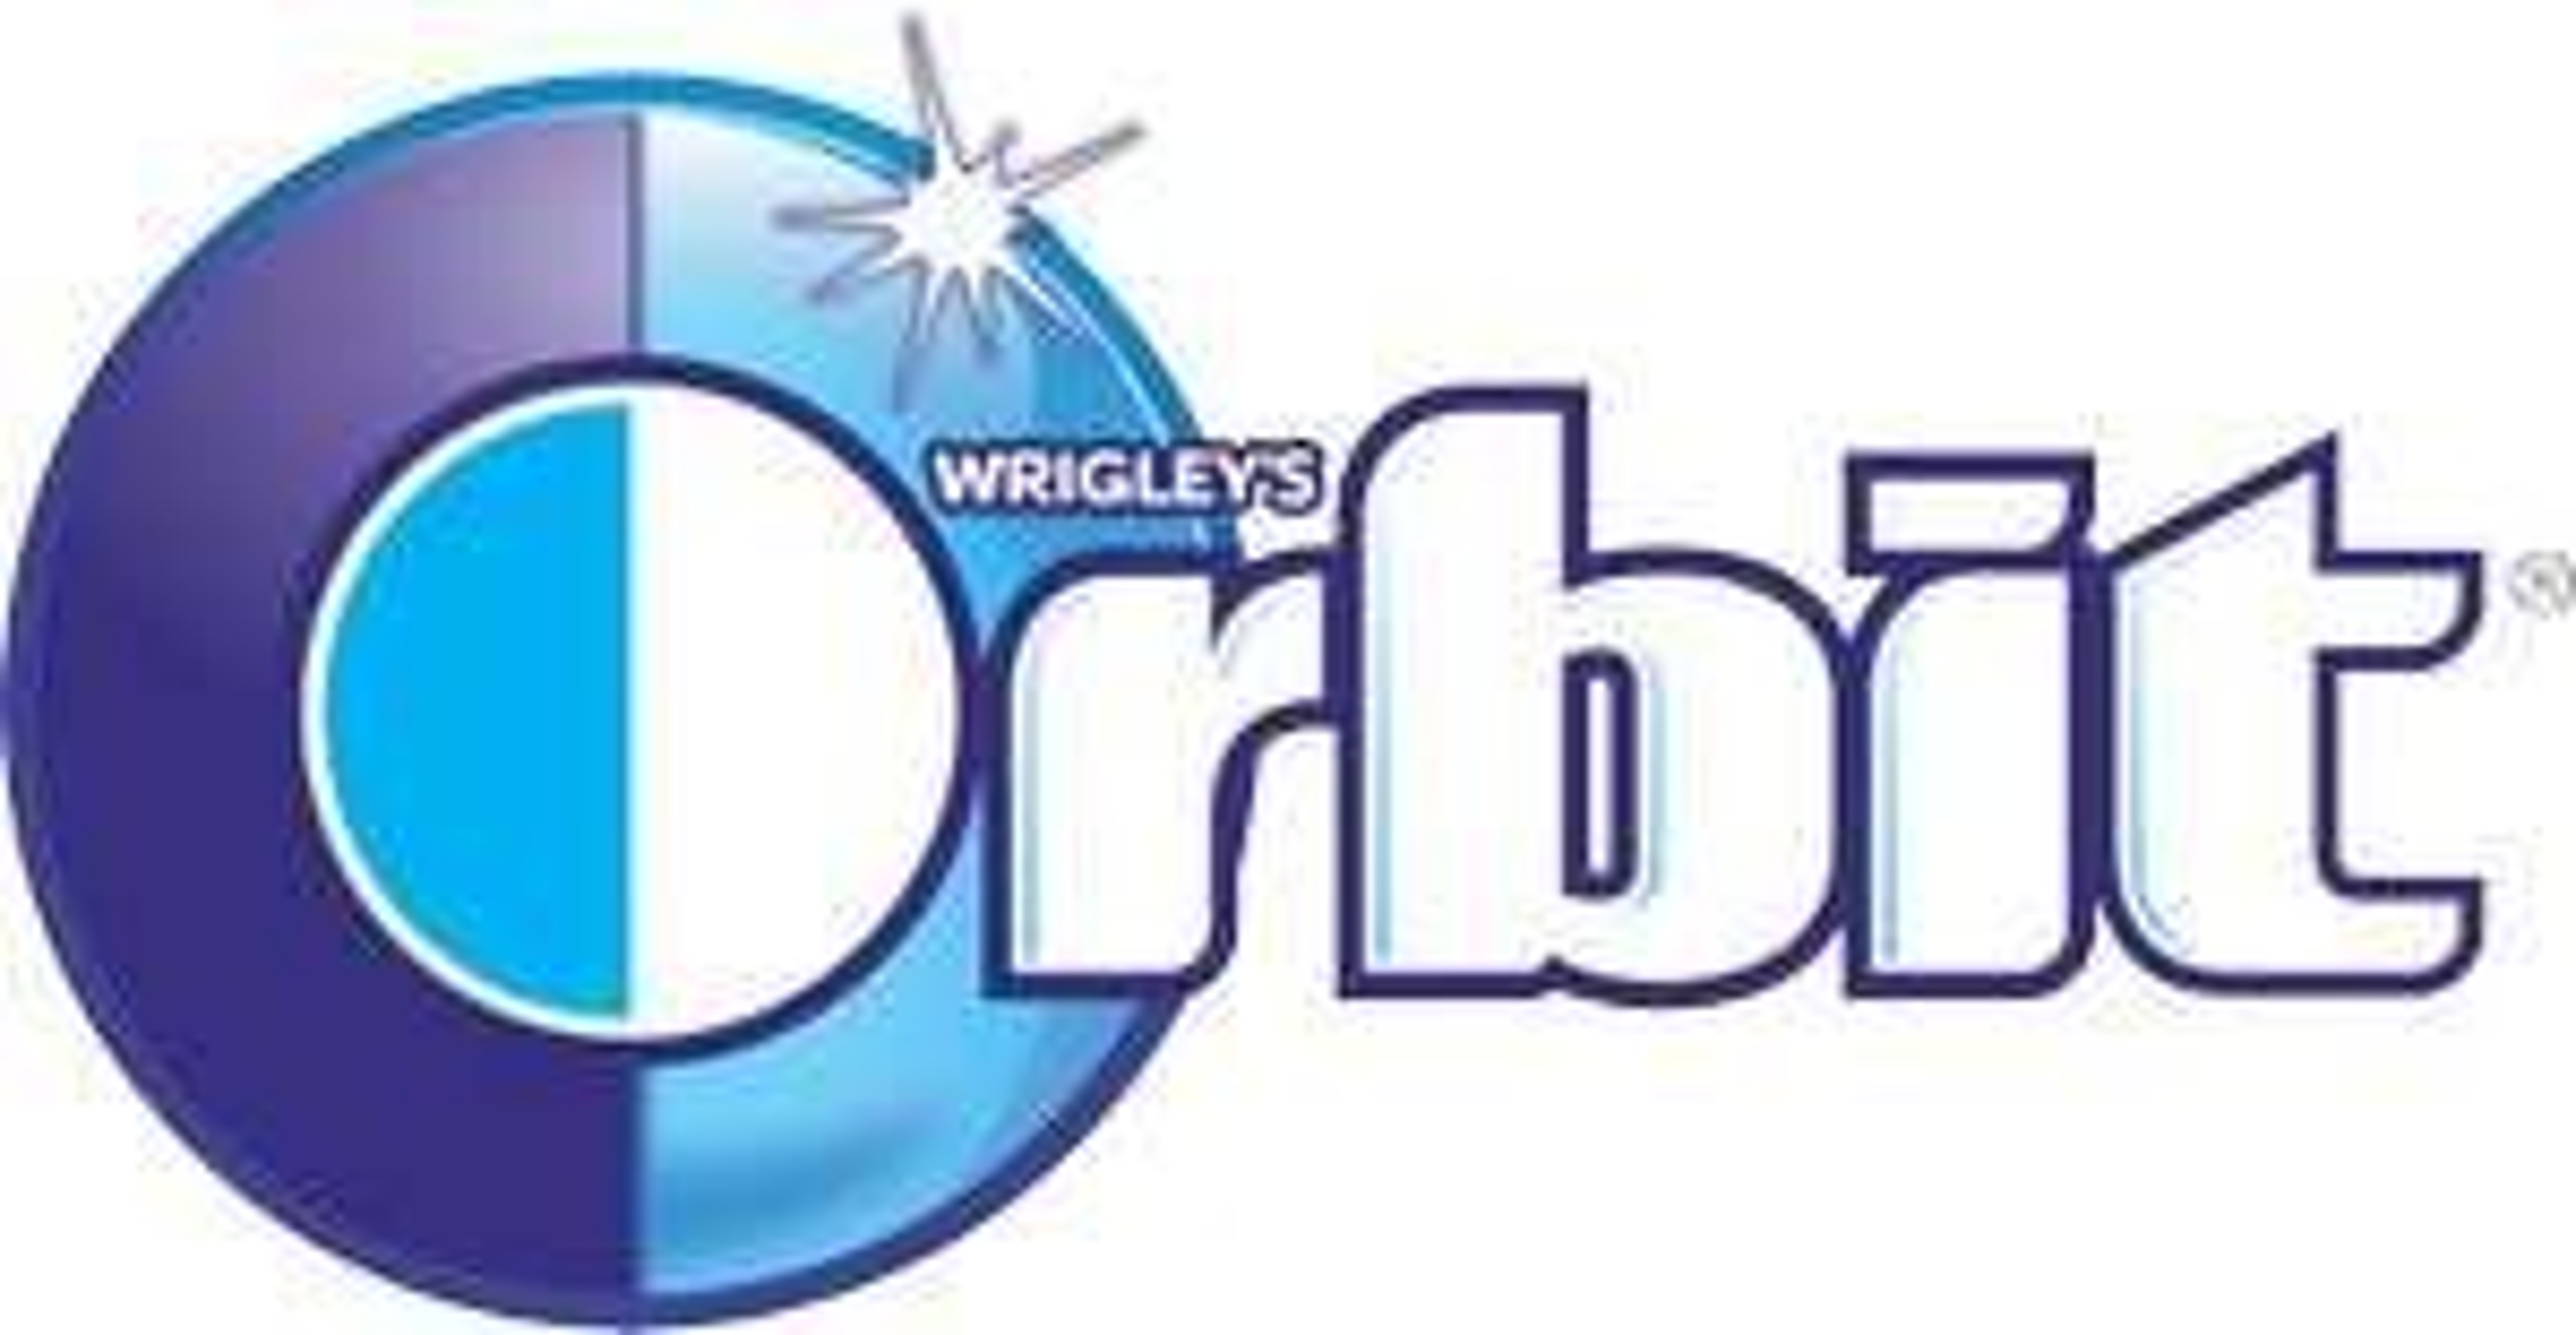 ORBIT 10er fast gratis - Billa/Merkur <-> Marktguru